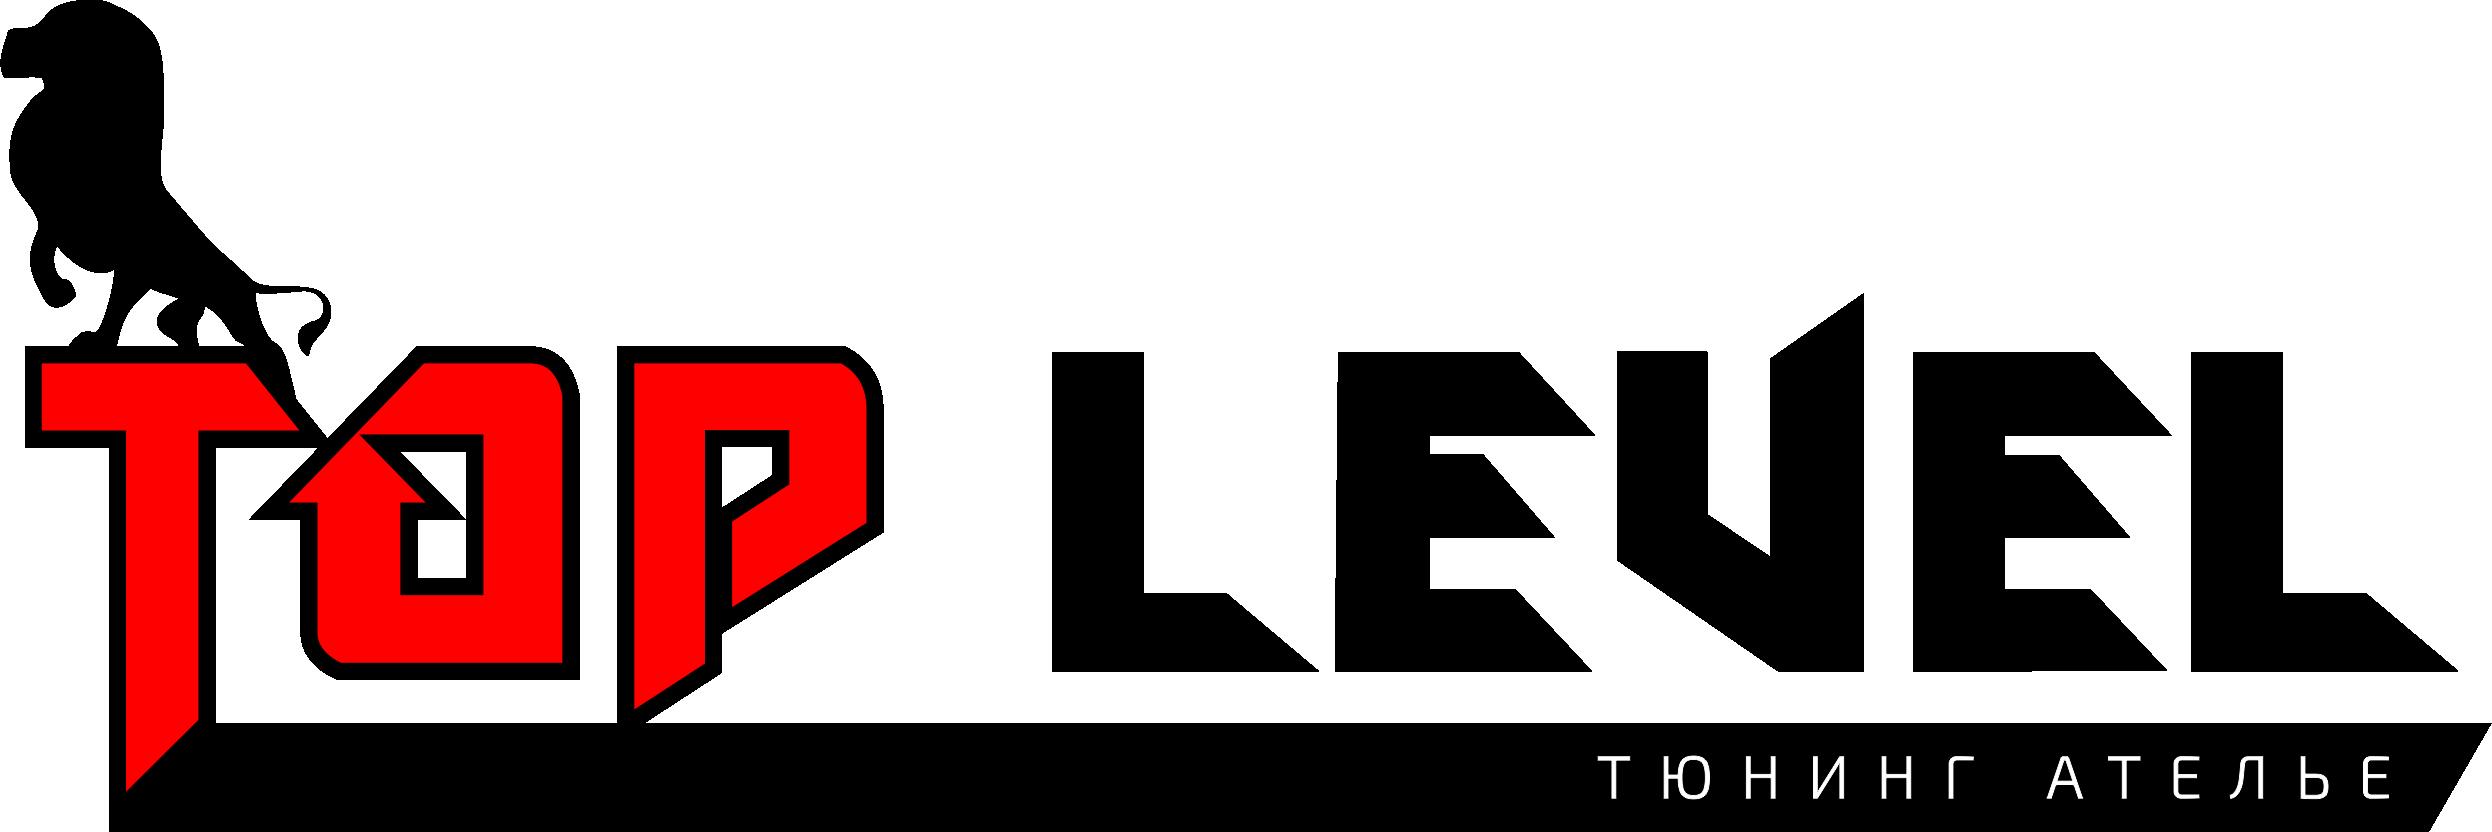 Разработка логотипа для тюнинг ателье фото f_7505f326ffd9300a.png